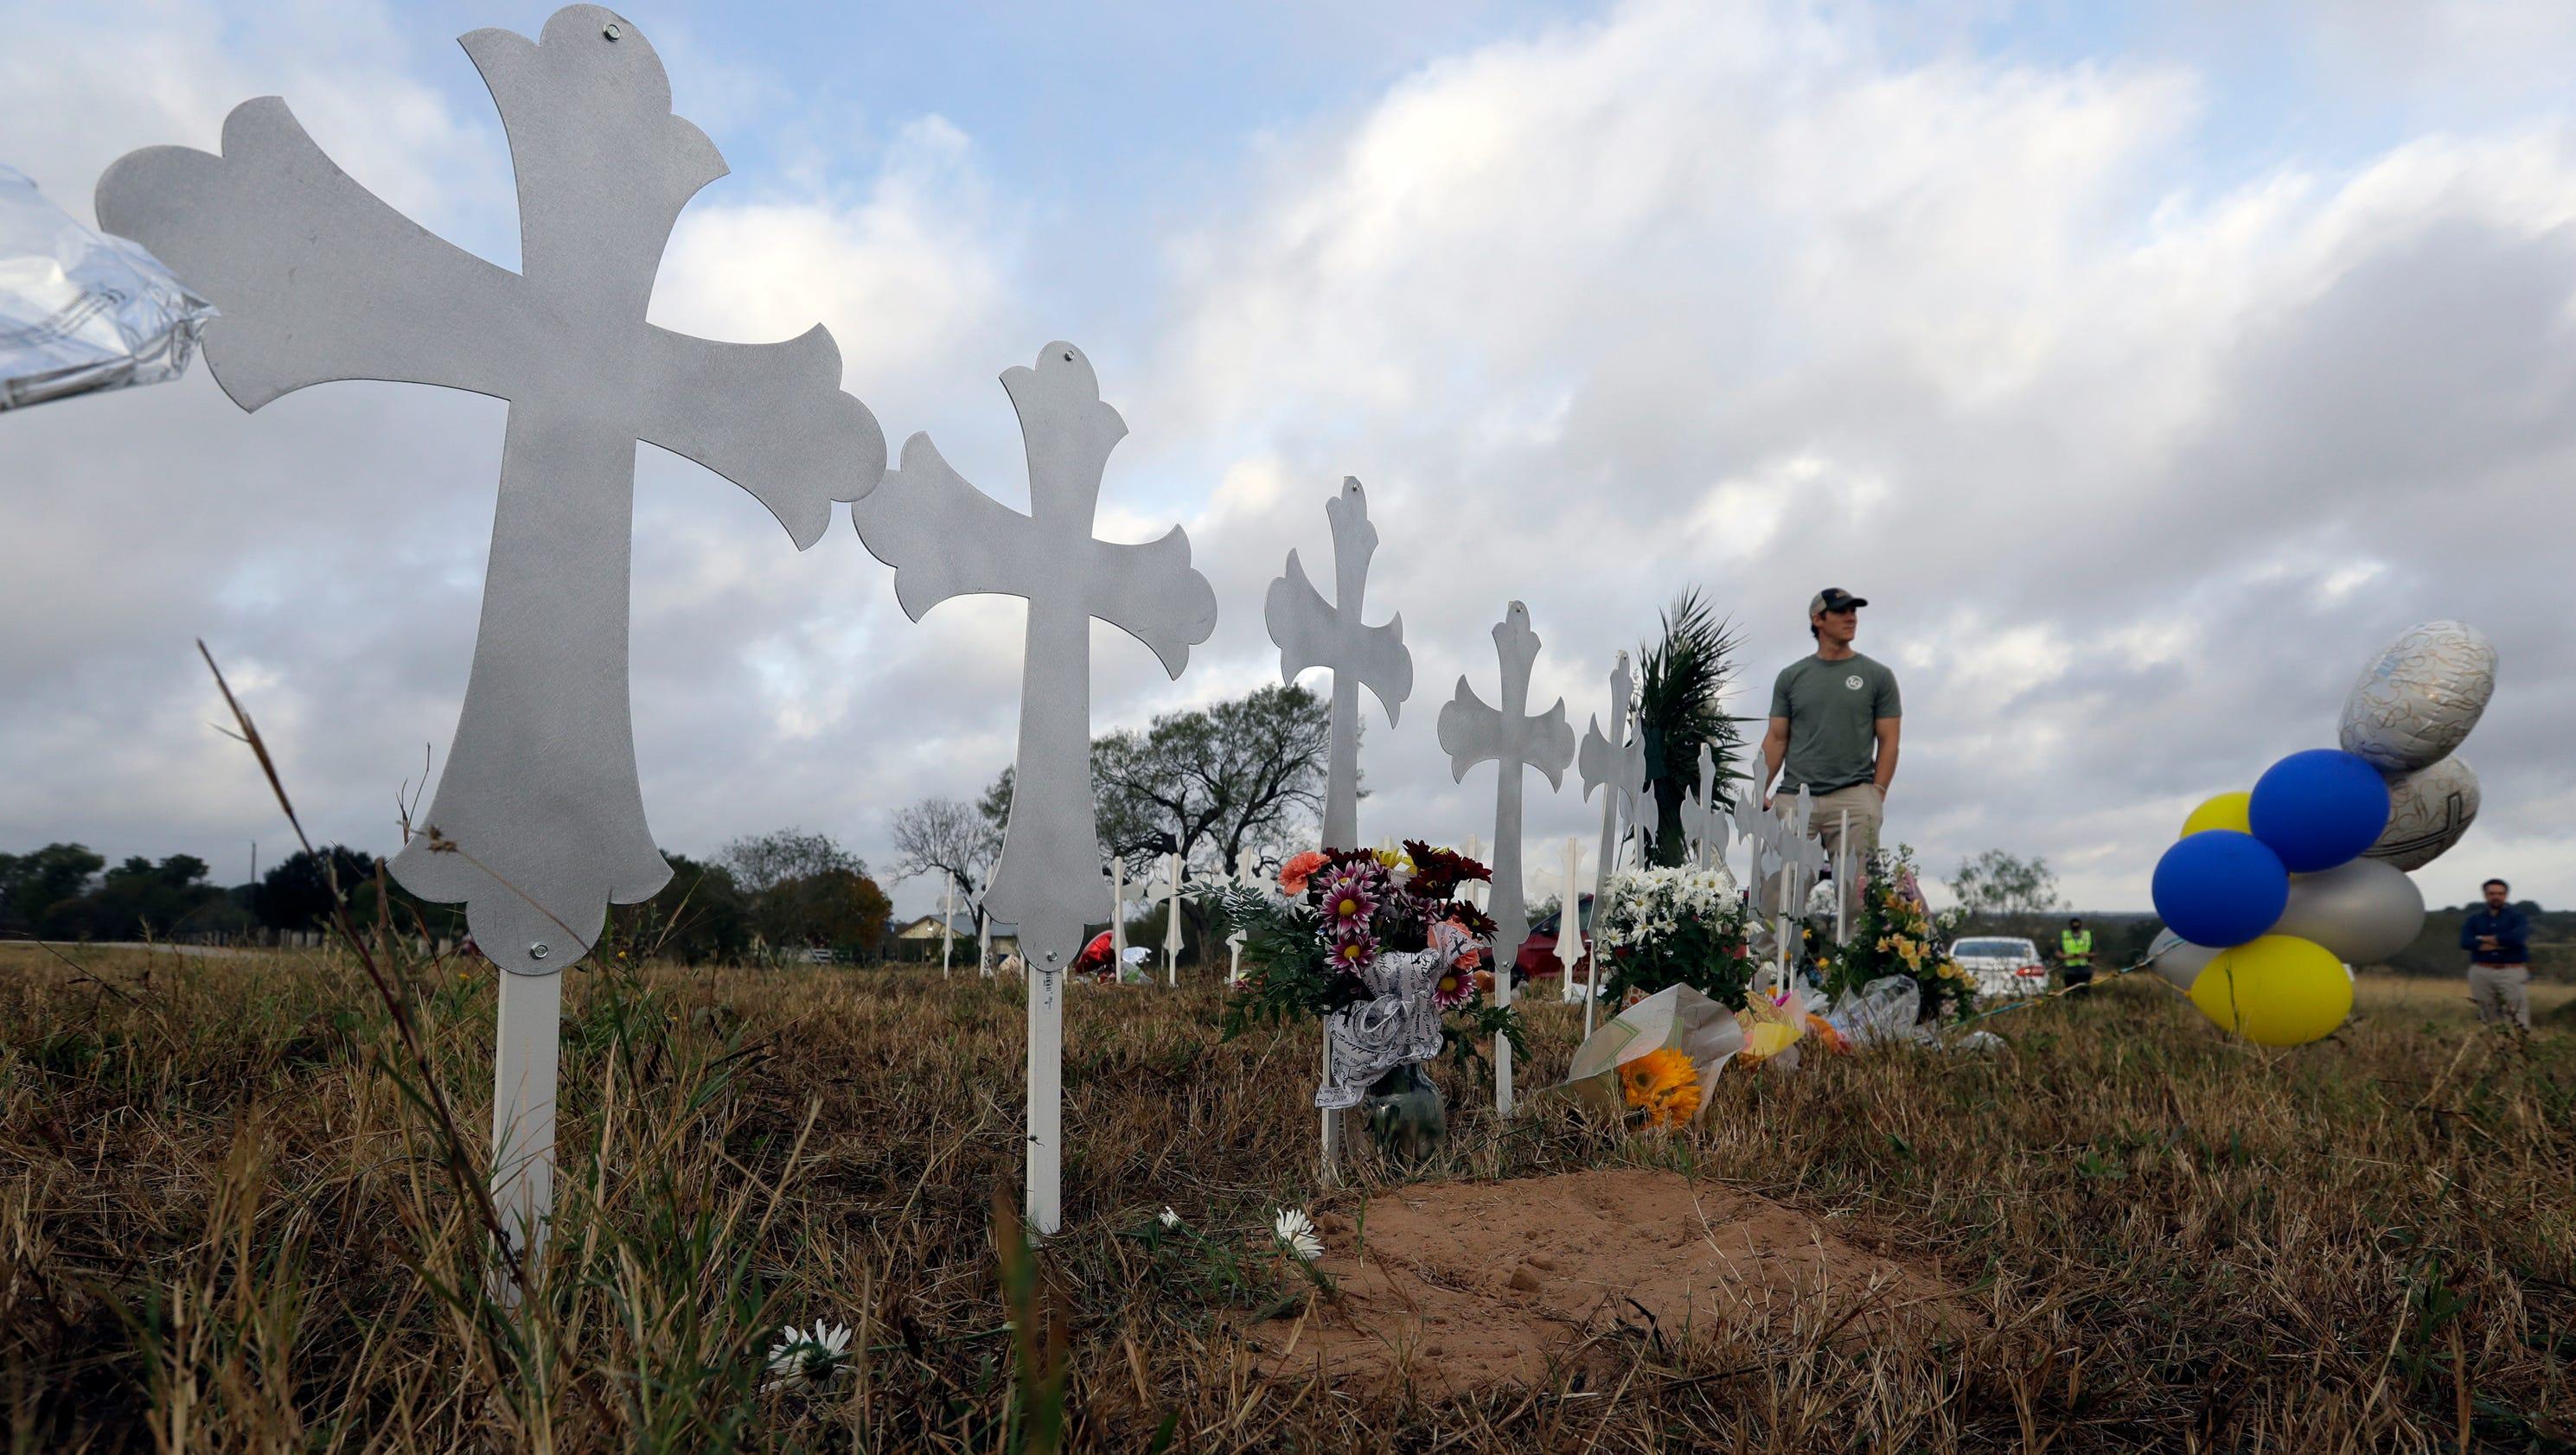 Texas shooting: Inside the church, gunman fired at crying children